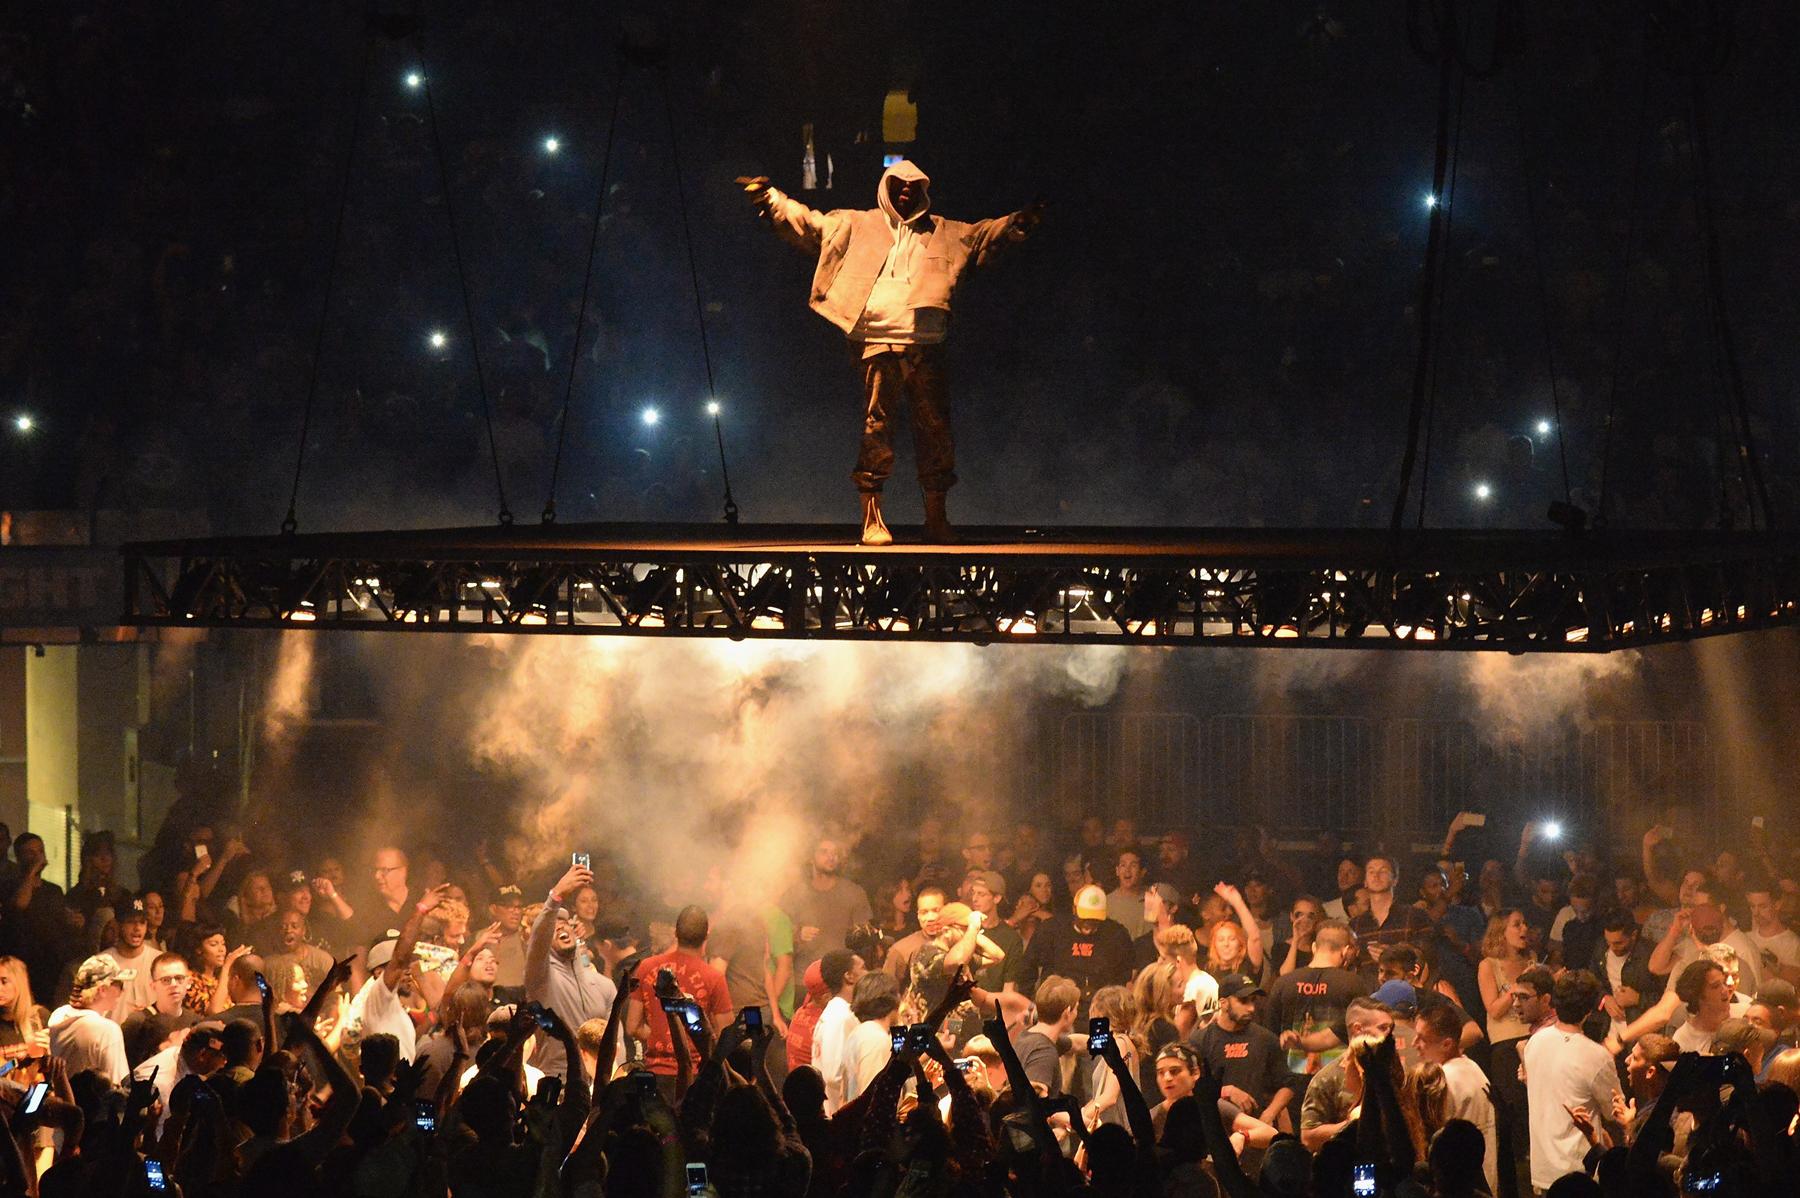 Kanye Turns to His 'Saint Pablo' Tour to Help Overcome the Criticism Surrounding YEEZY Season 4